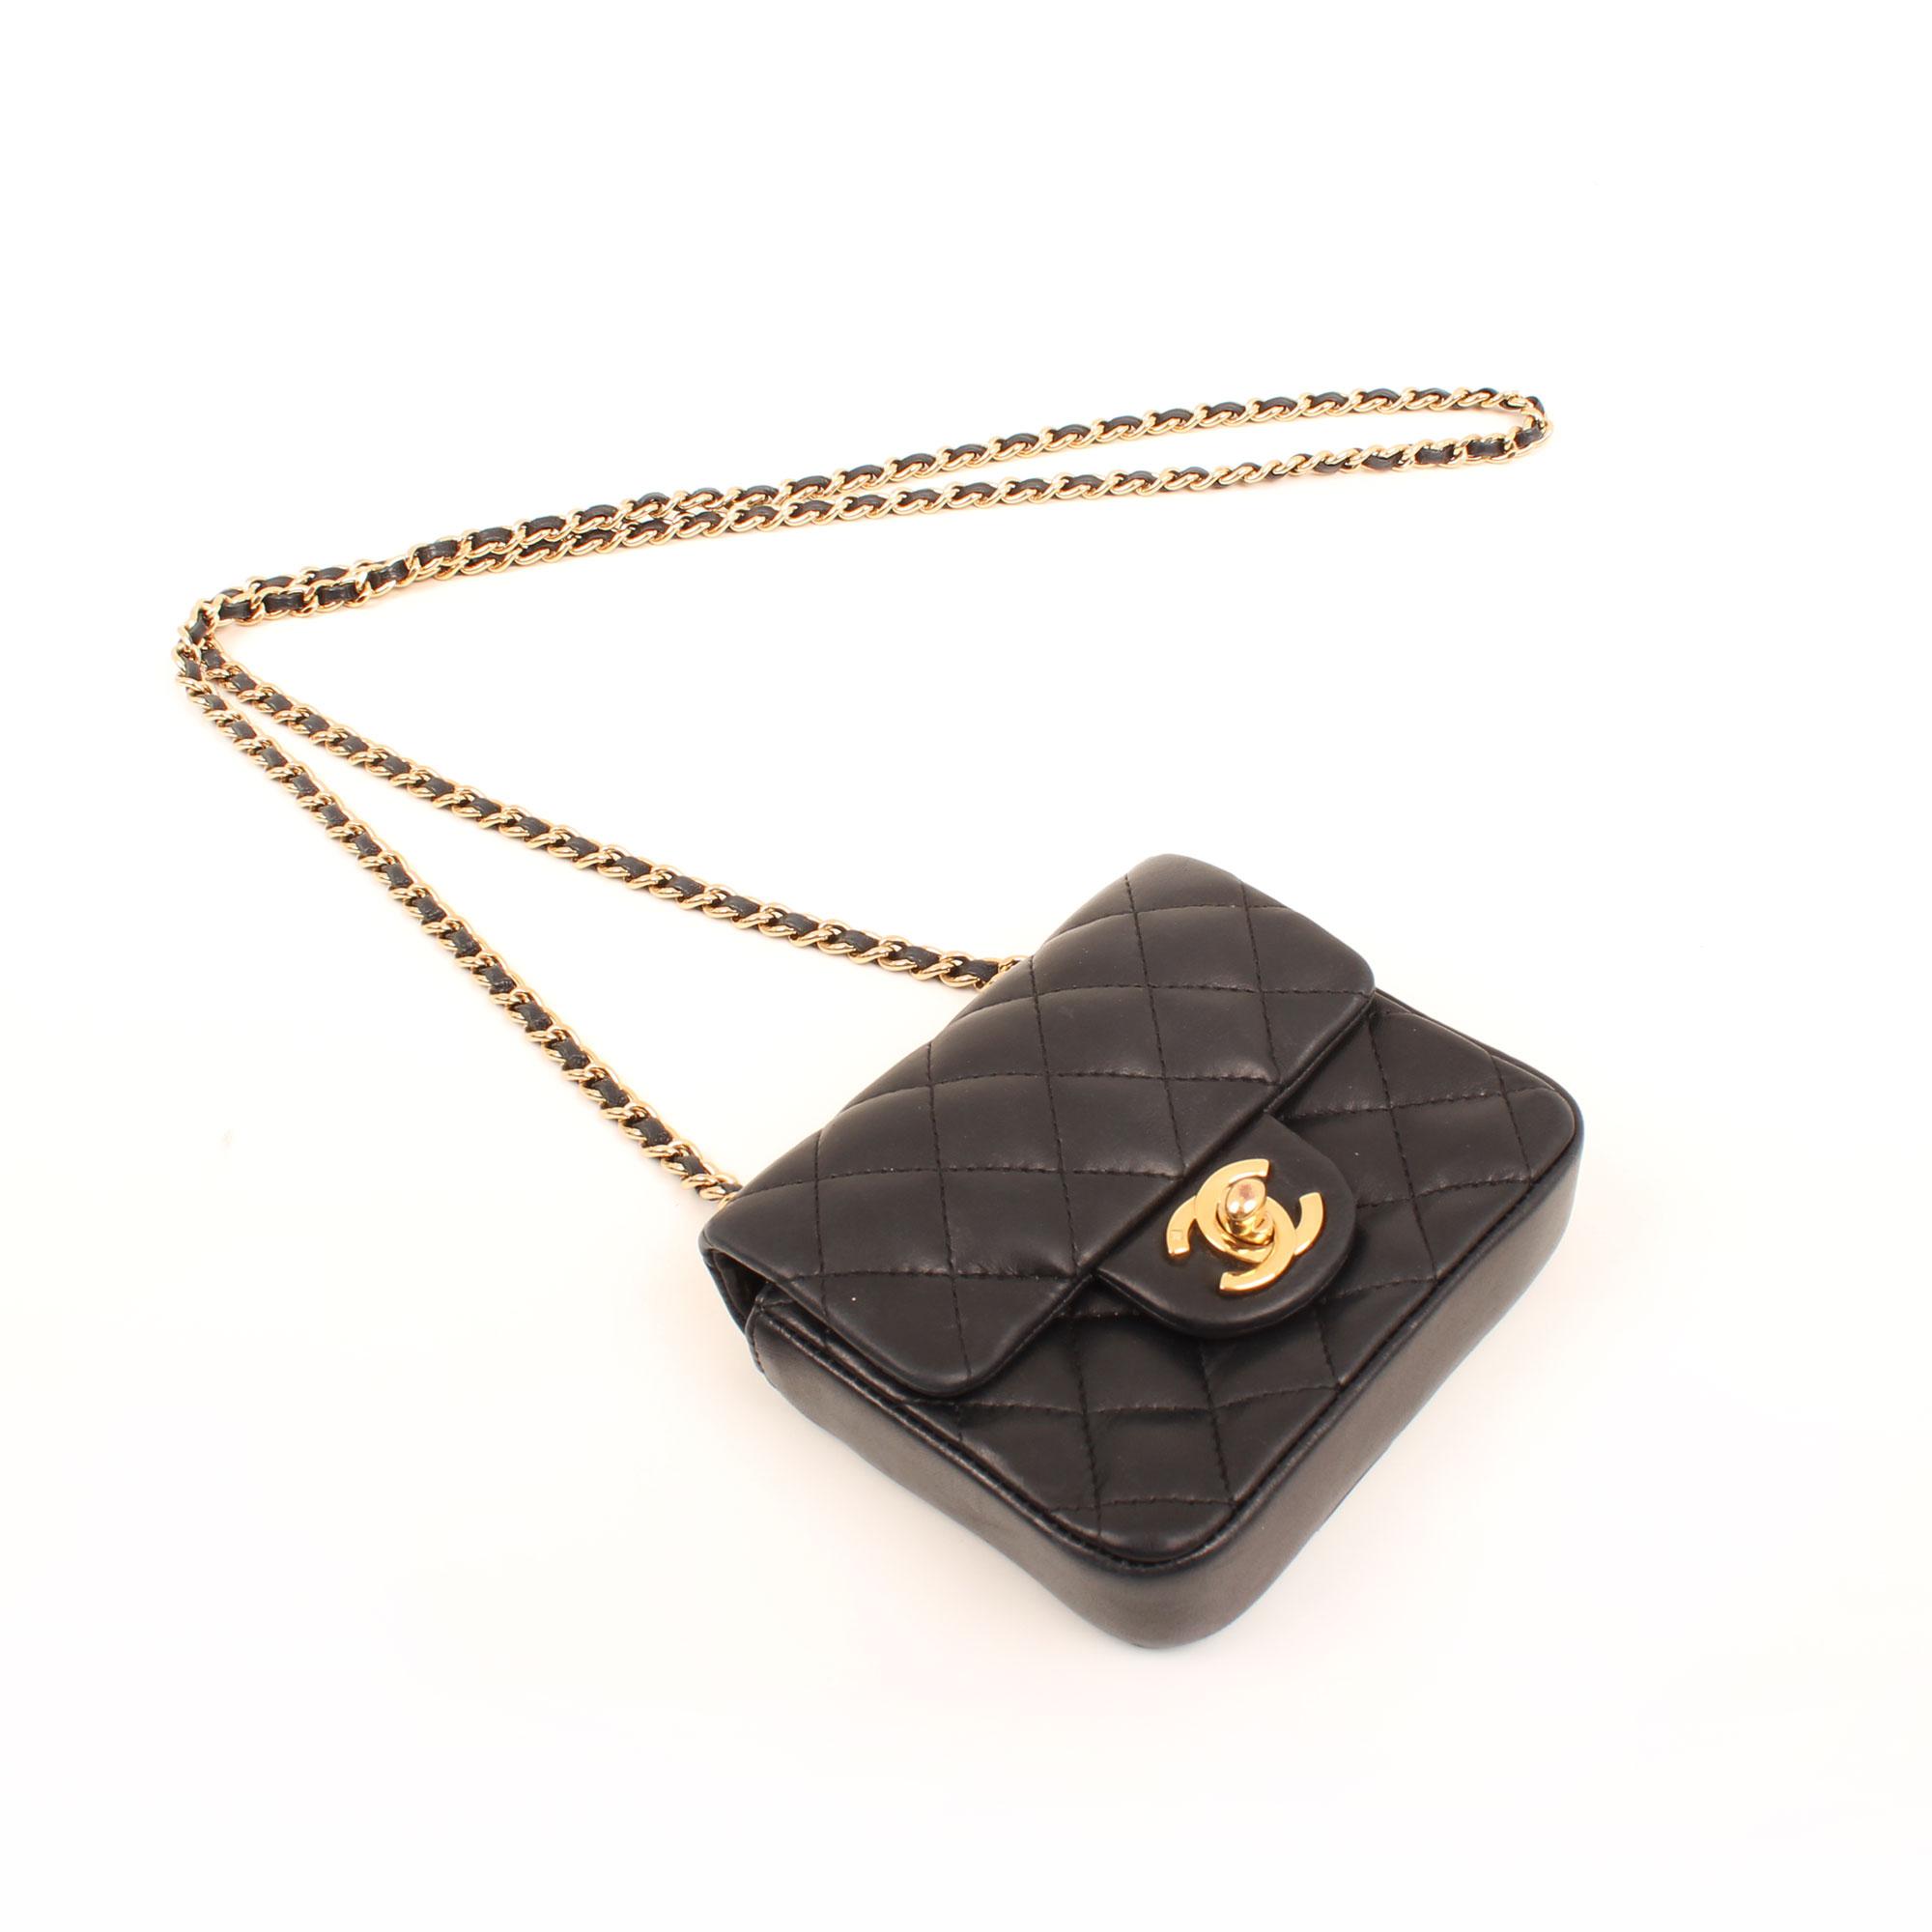 General image of chanel micro mini black bag